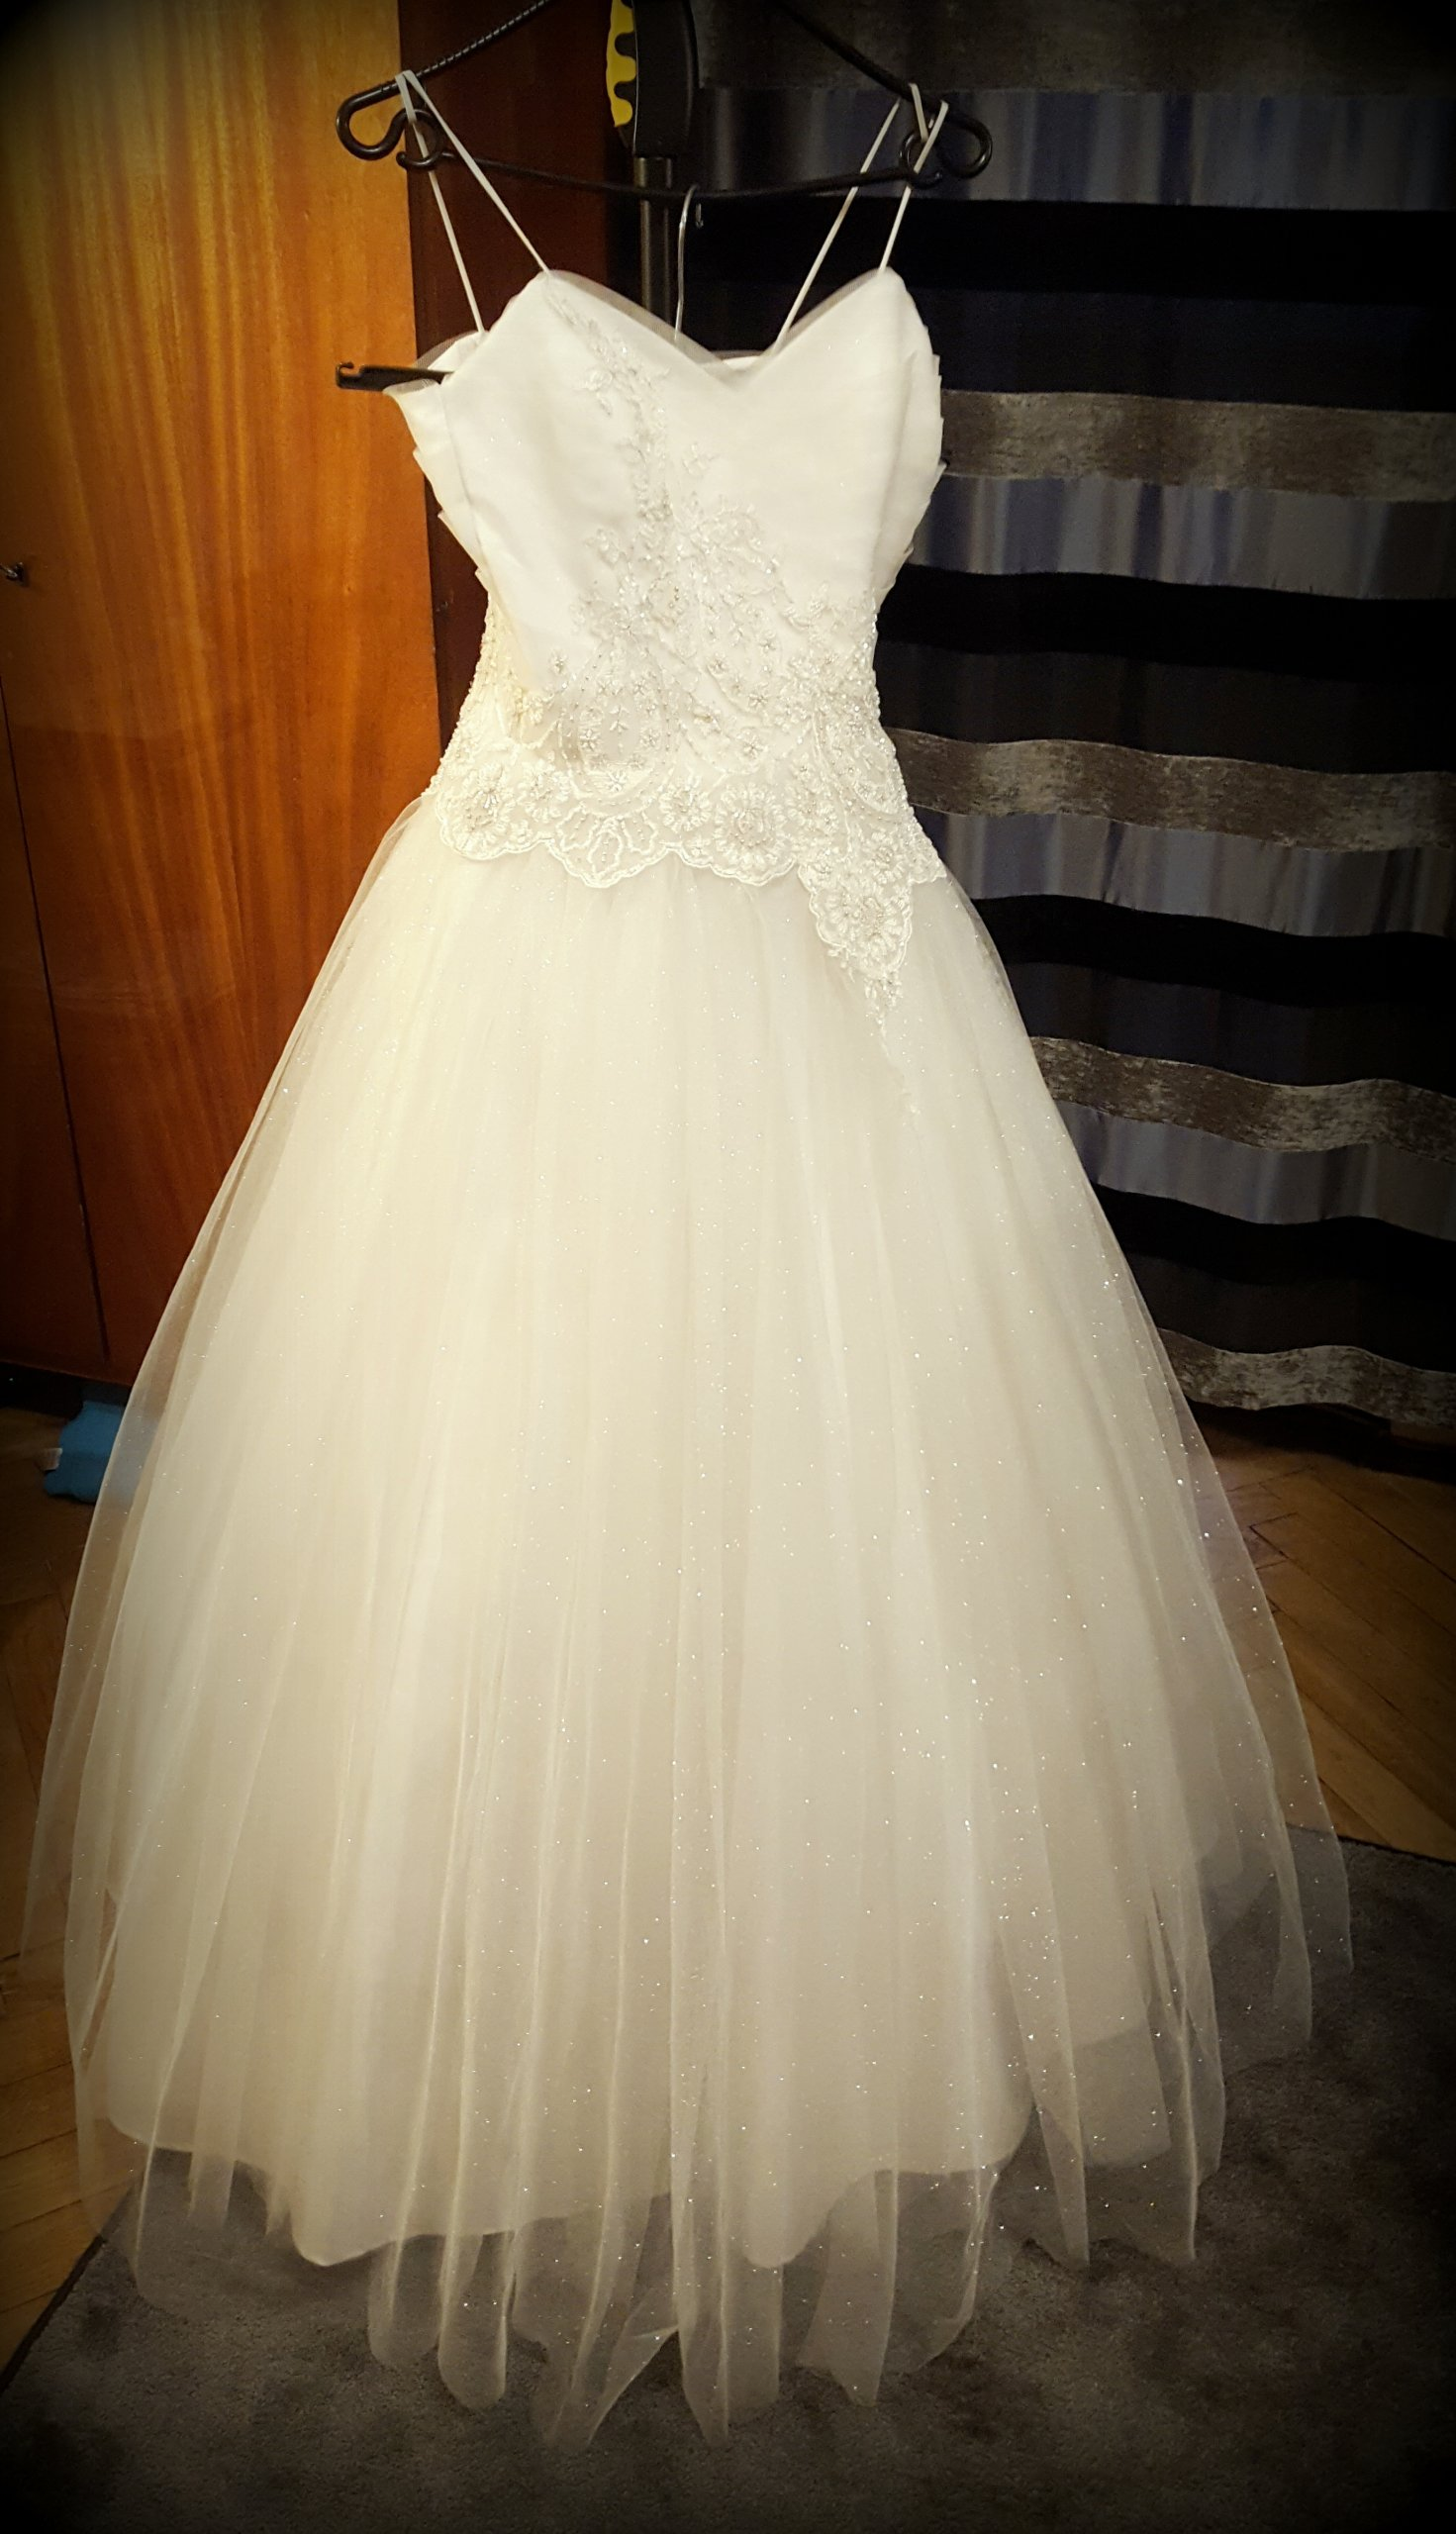 Suknia ślubna Princessa 36 Mieniący Tiul 7397337129 Oficjalne